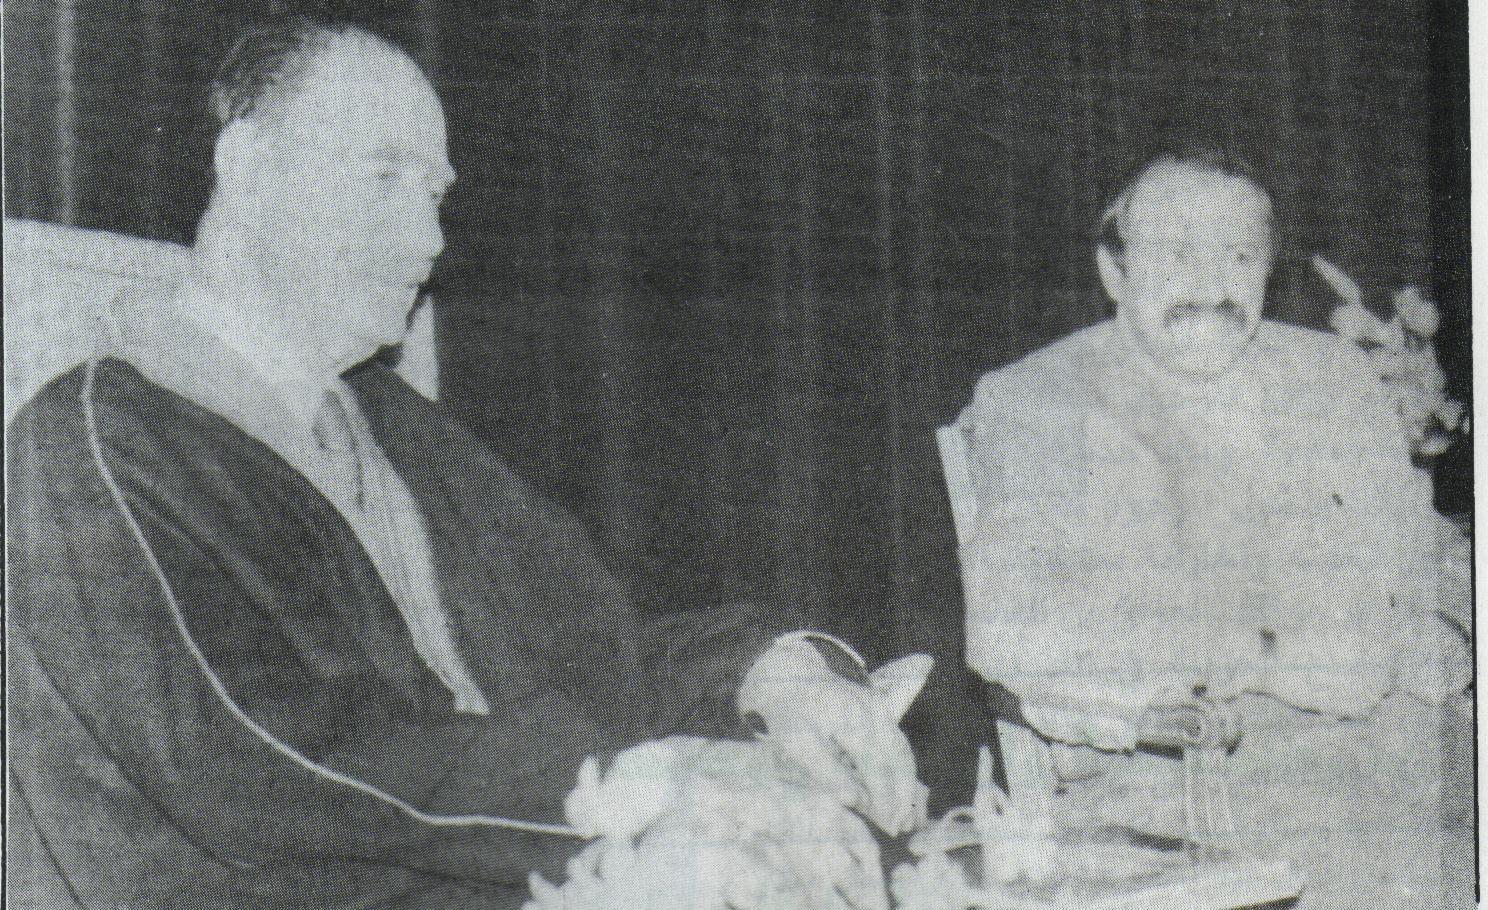 98faacdc5484e مع عبد الله بكر اخر رئيس للديوان الملكي قبل ثورة 14 تموز 1958